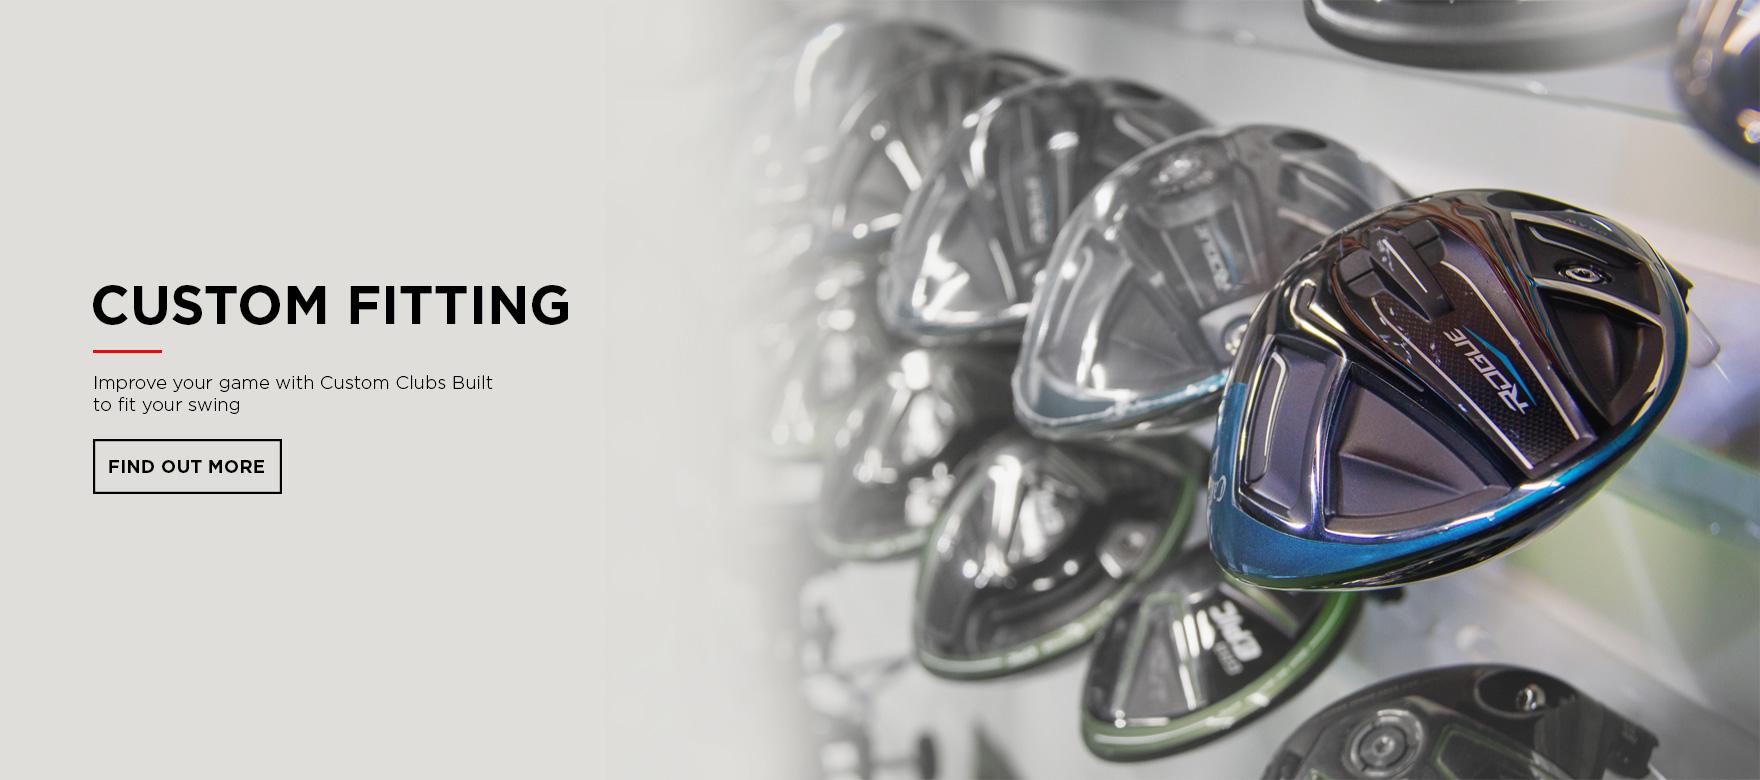 d3c827834f292 UK Golf Academy | Brentwood Golf Range - Coaching & Custom Fit Centre